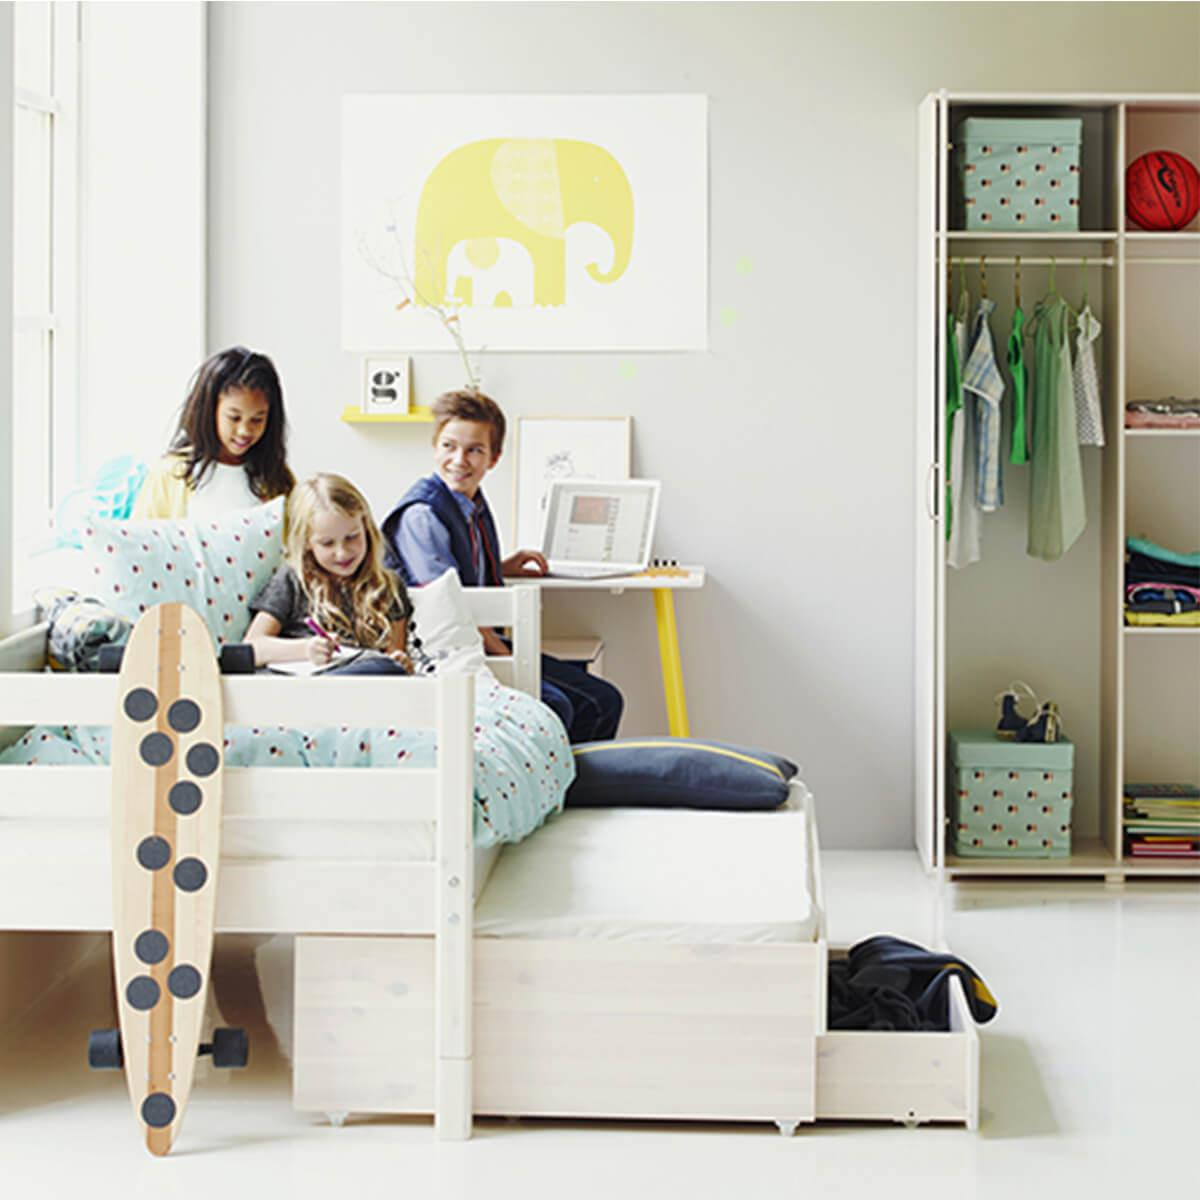 Lit enfant simple 90x200cm lit gigogne-2 tiroirs WHITE Flexa naturel-blanc